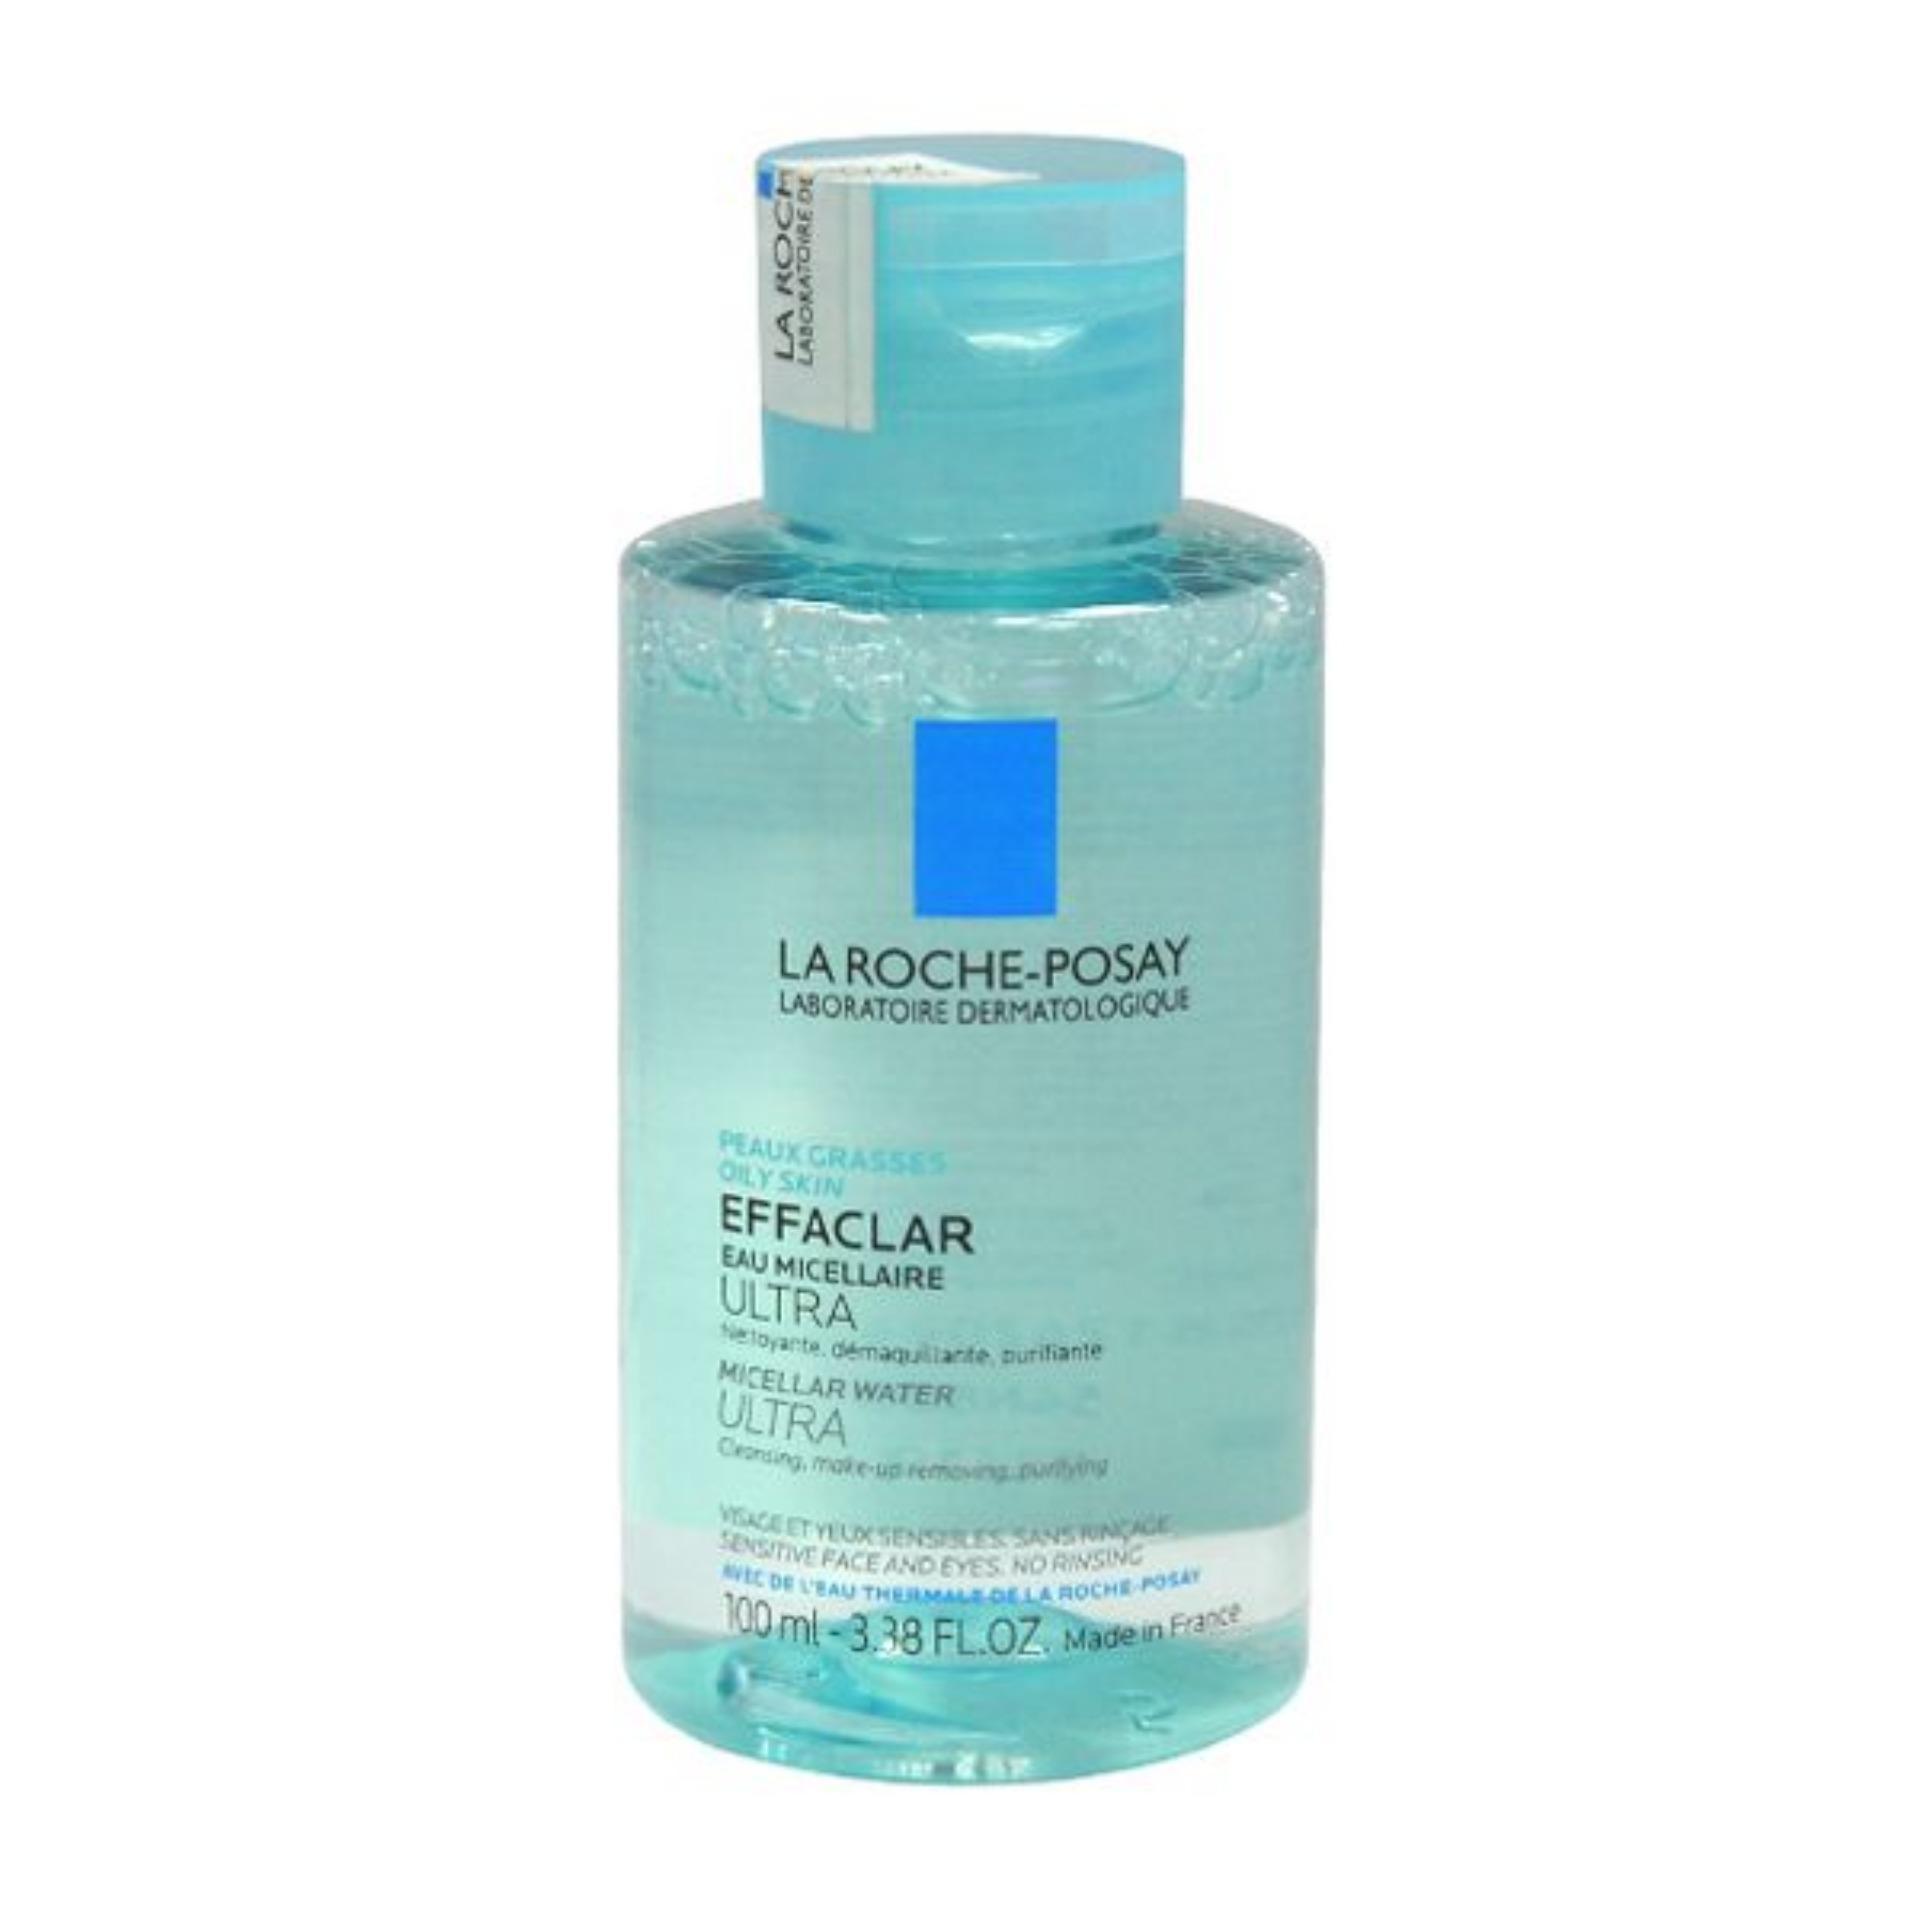 La Roche Posay Nước Tẩy Trang Micellar Water Ultra Oily 100ml cao cấp